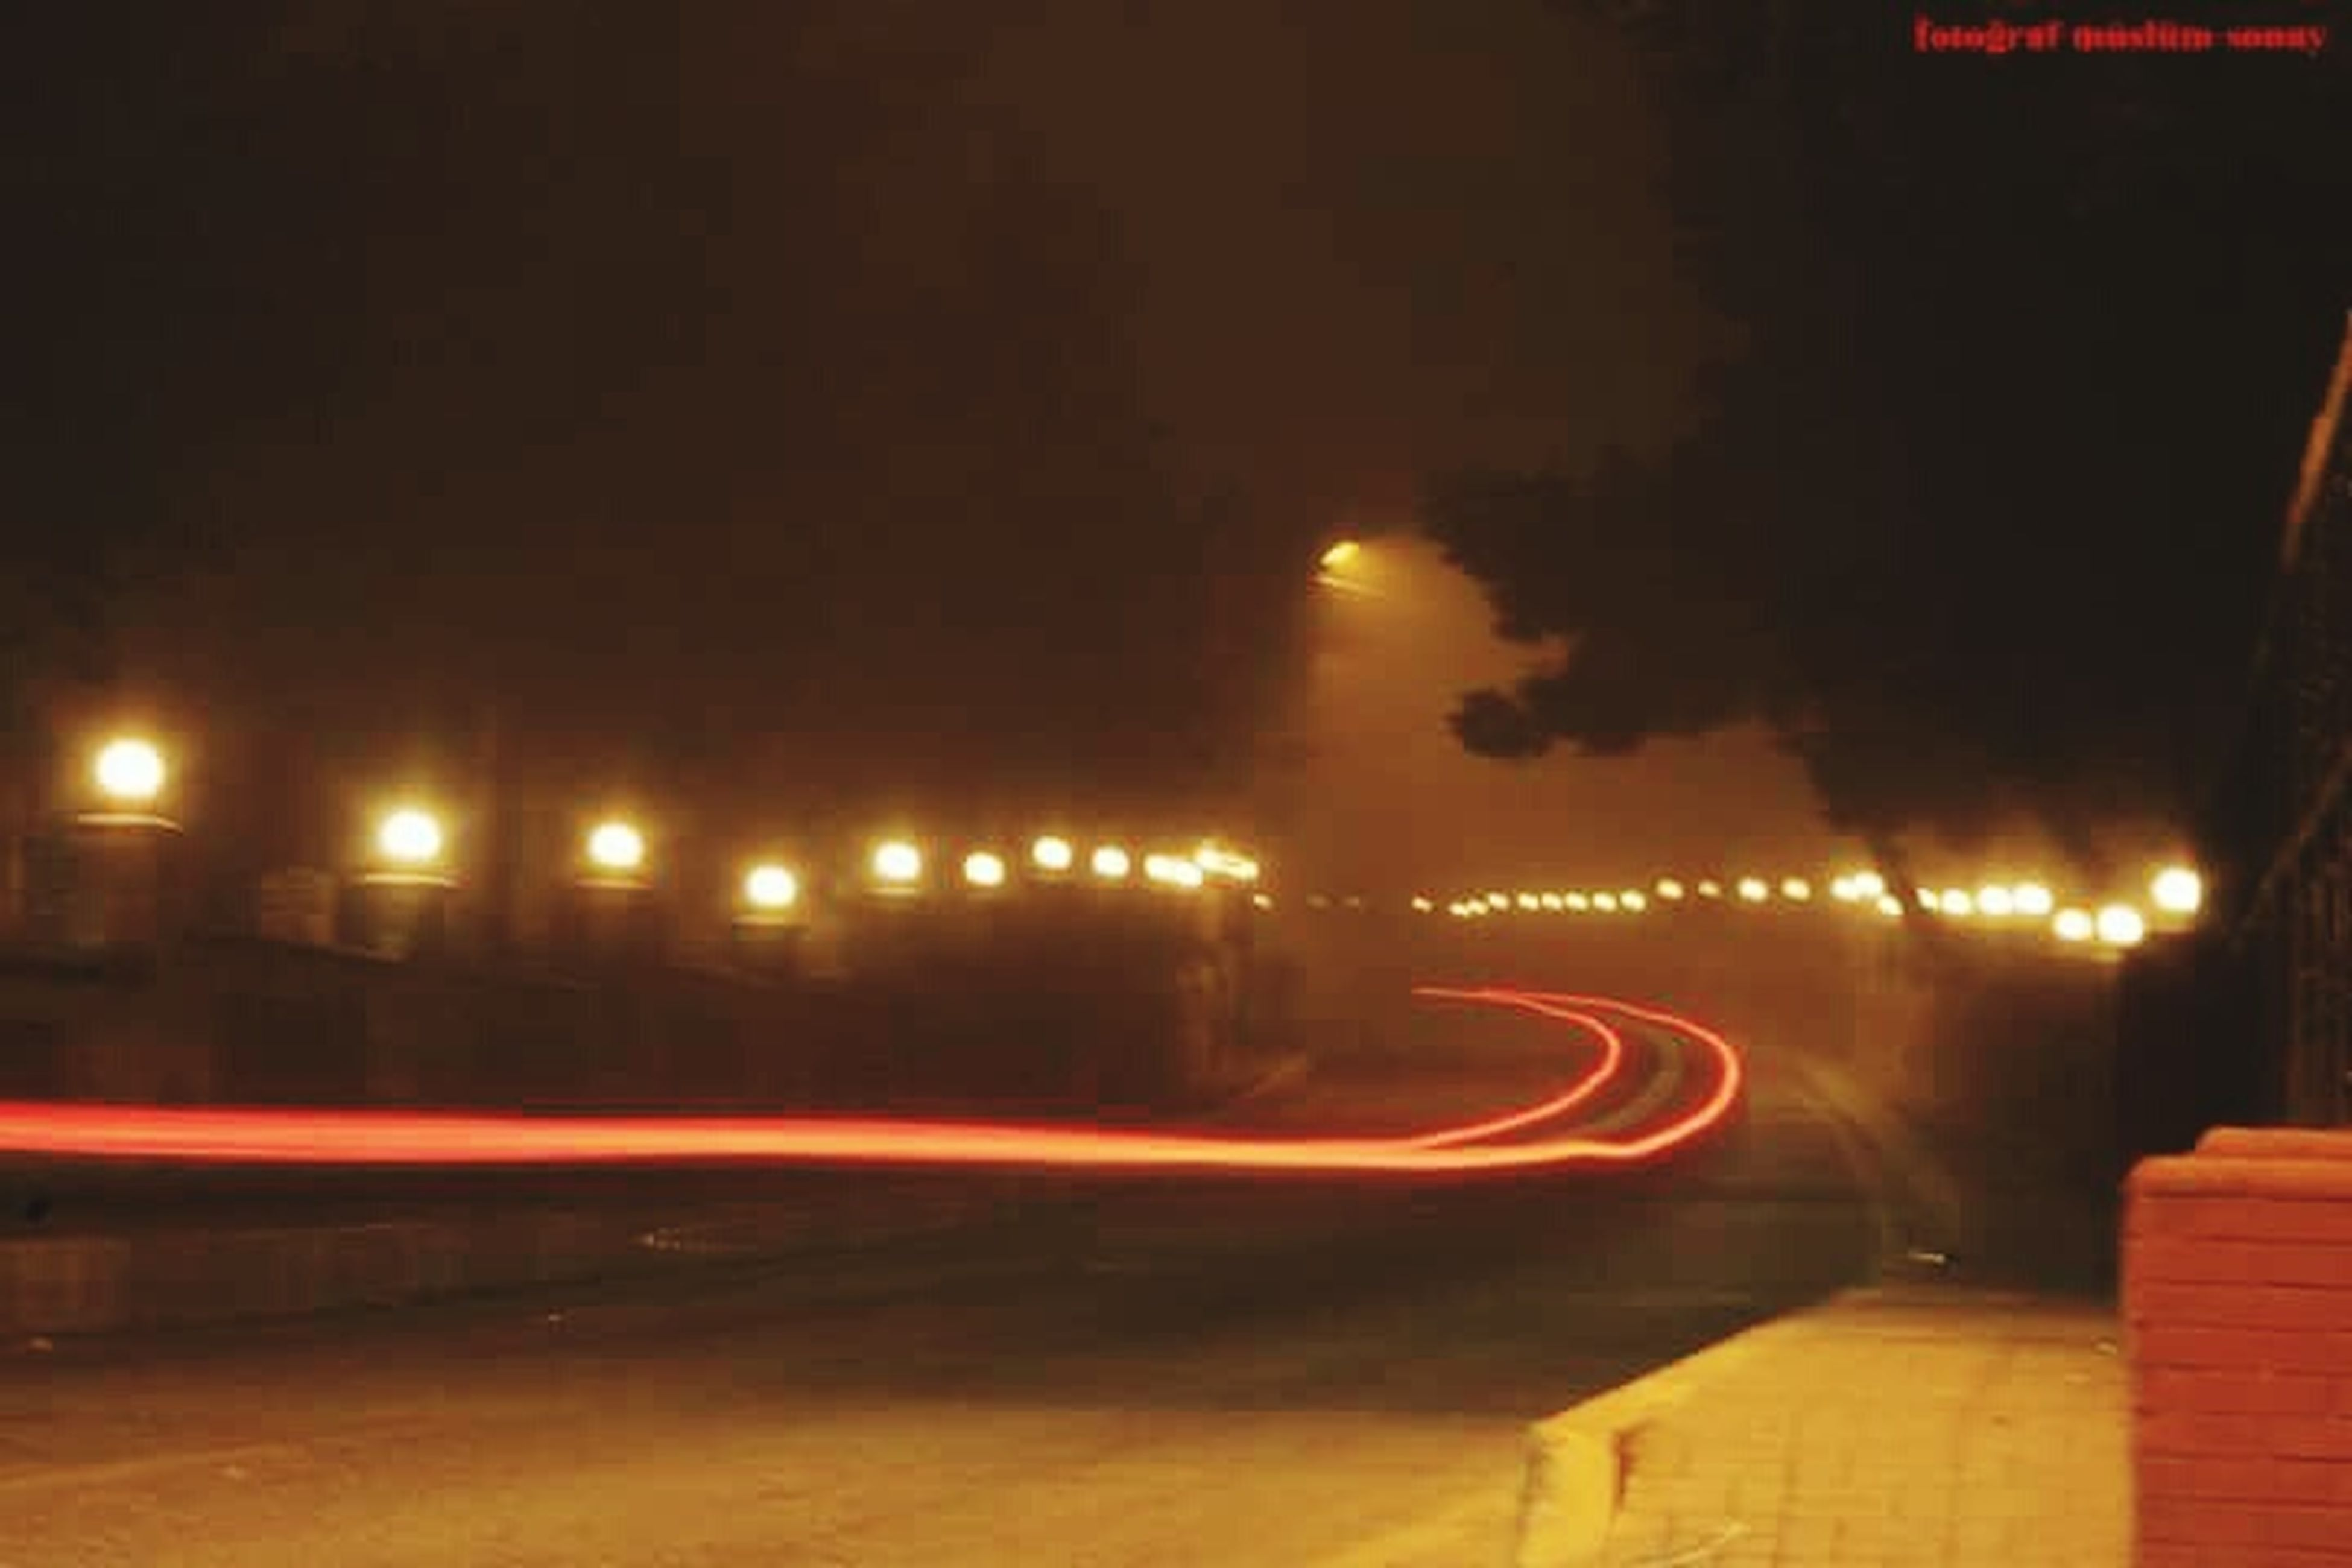 illuminated, night, transportation, long exposure, light trail, street light, speed, motion, lighting equipment, the way forward, road, blurred motion, street, city, sky, building exterior, mode of transport, light - natural phenomenon, on the move, city life